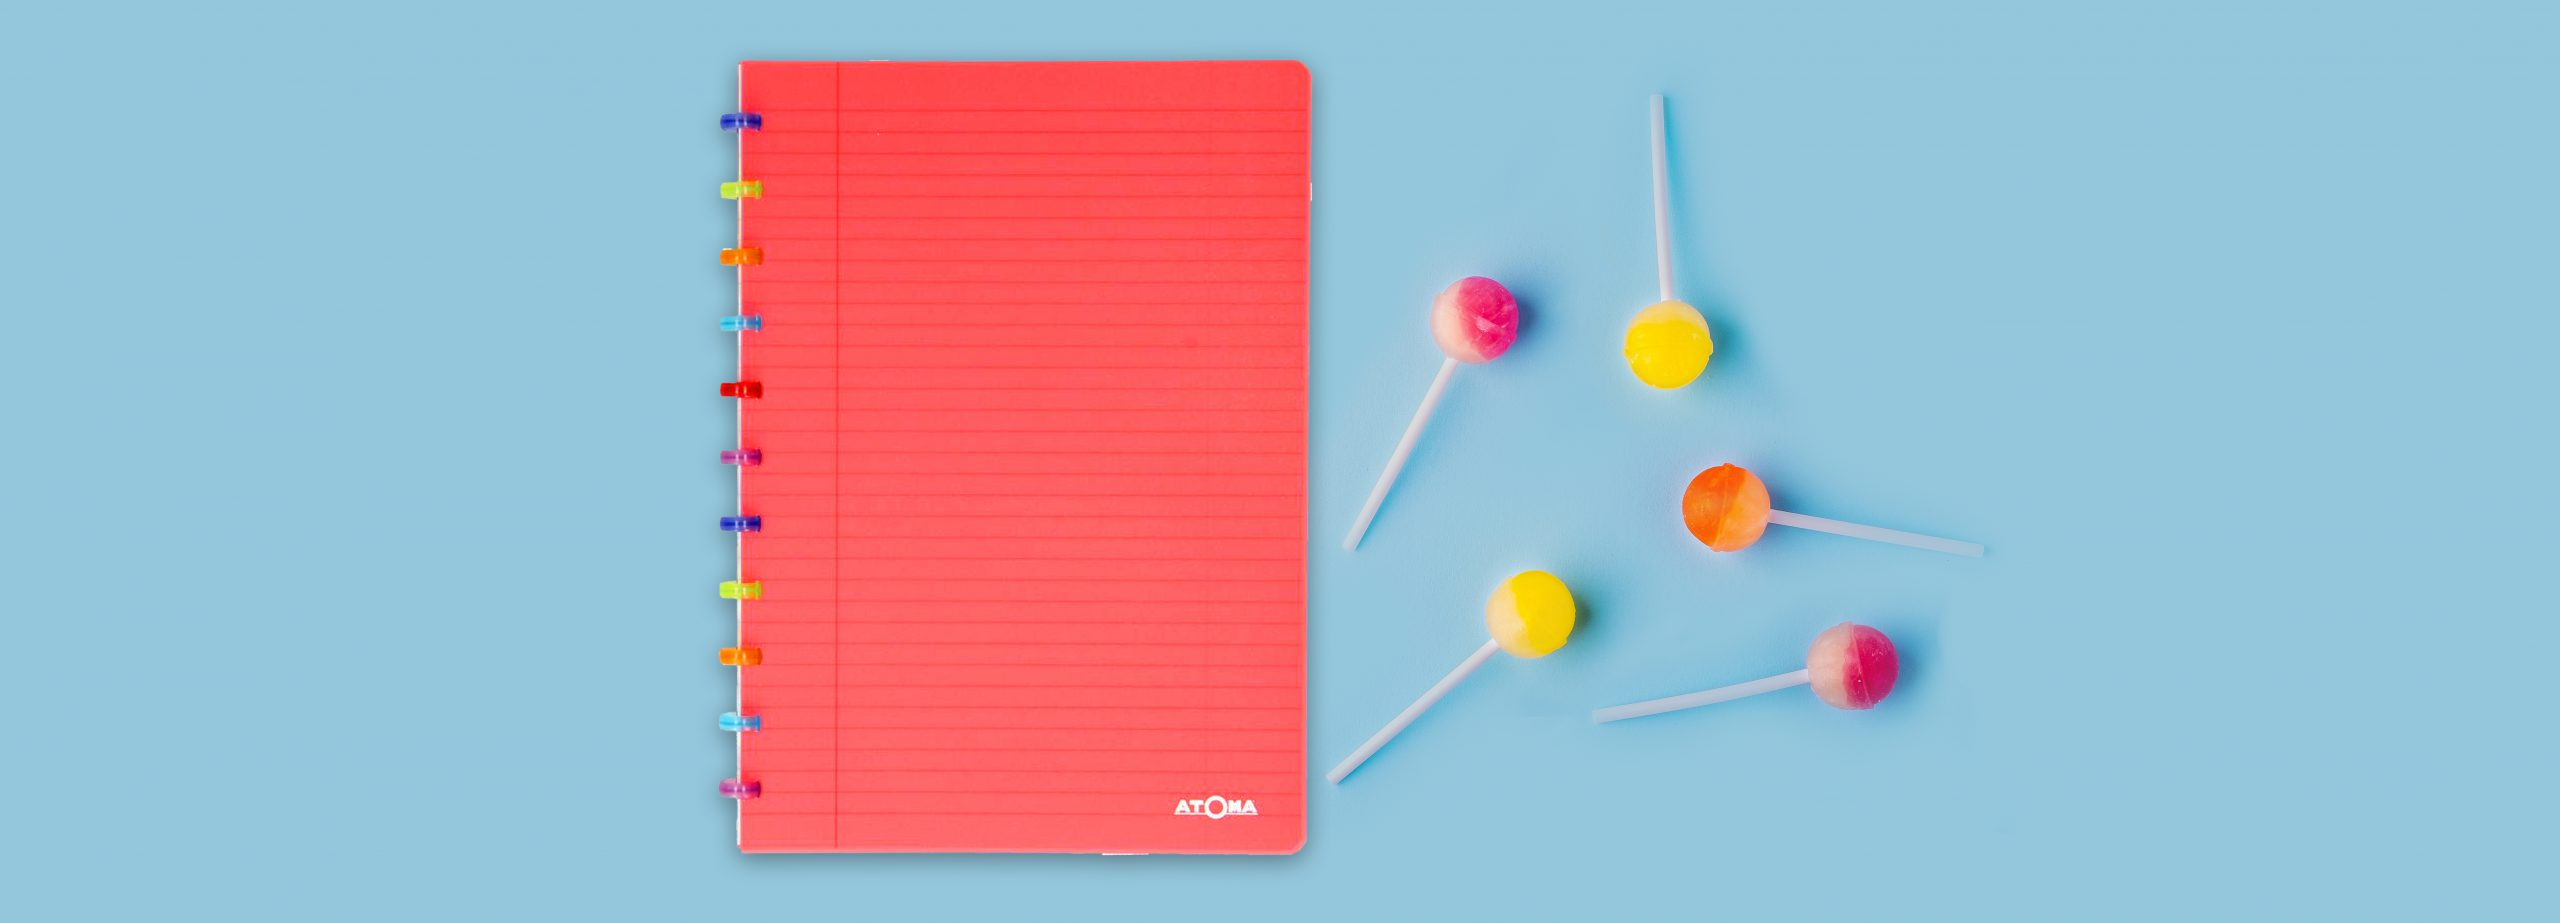 Atoma - Album de présentation Tutti Frutti